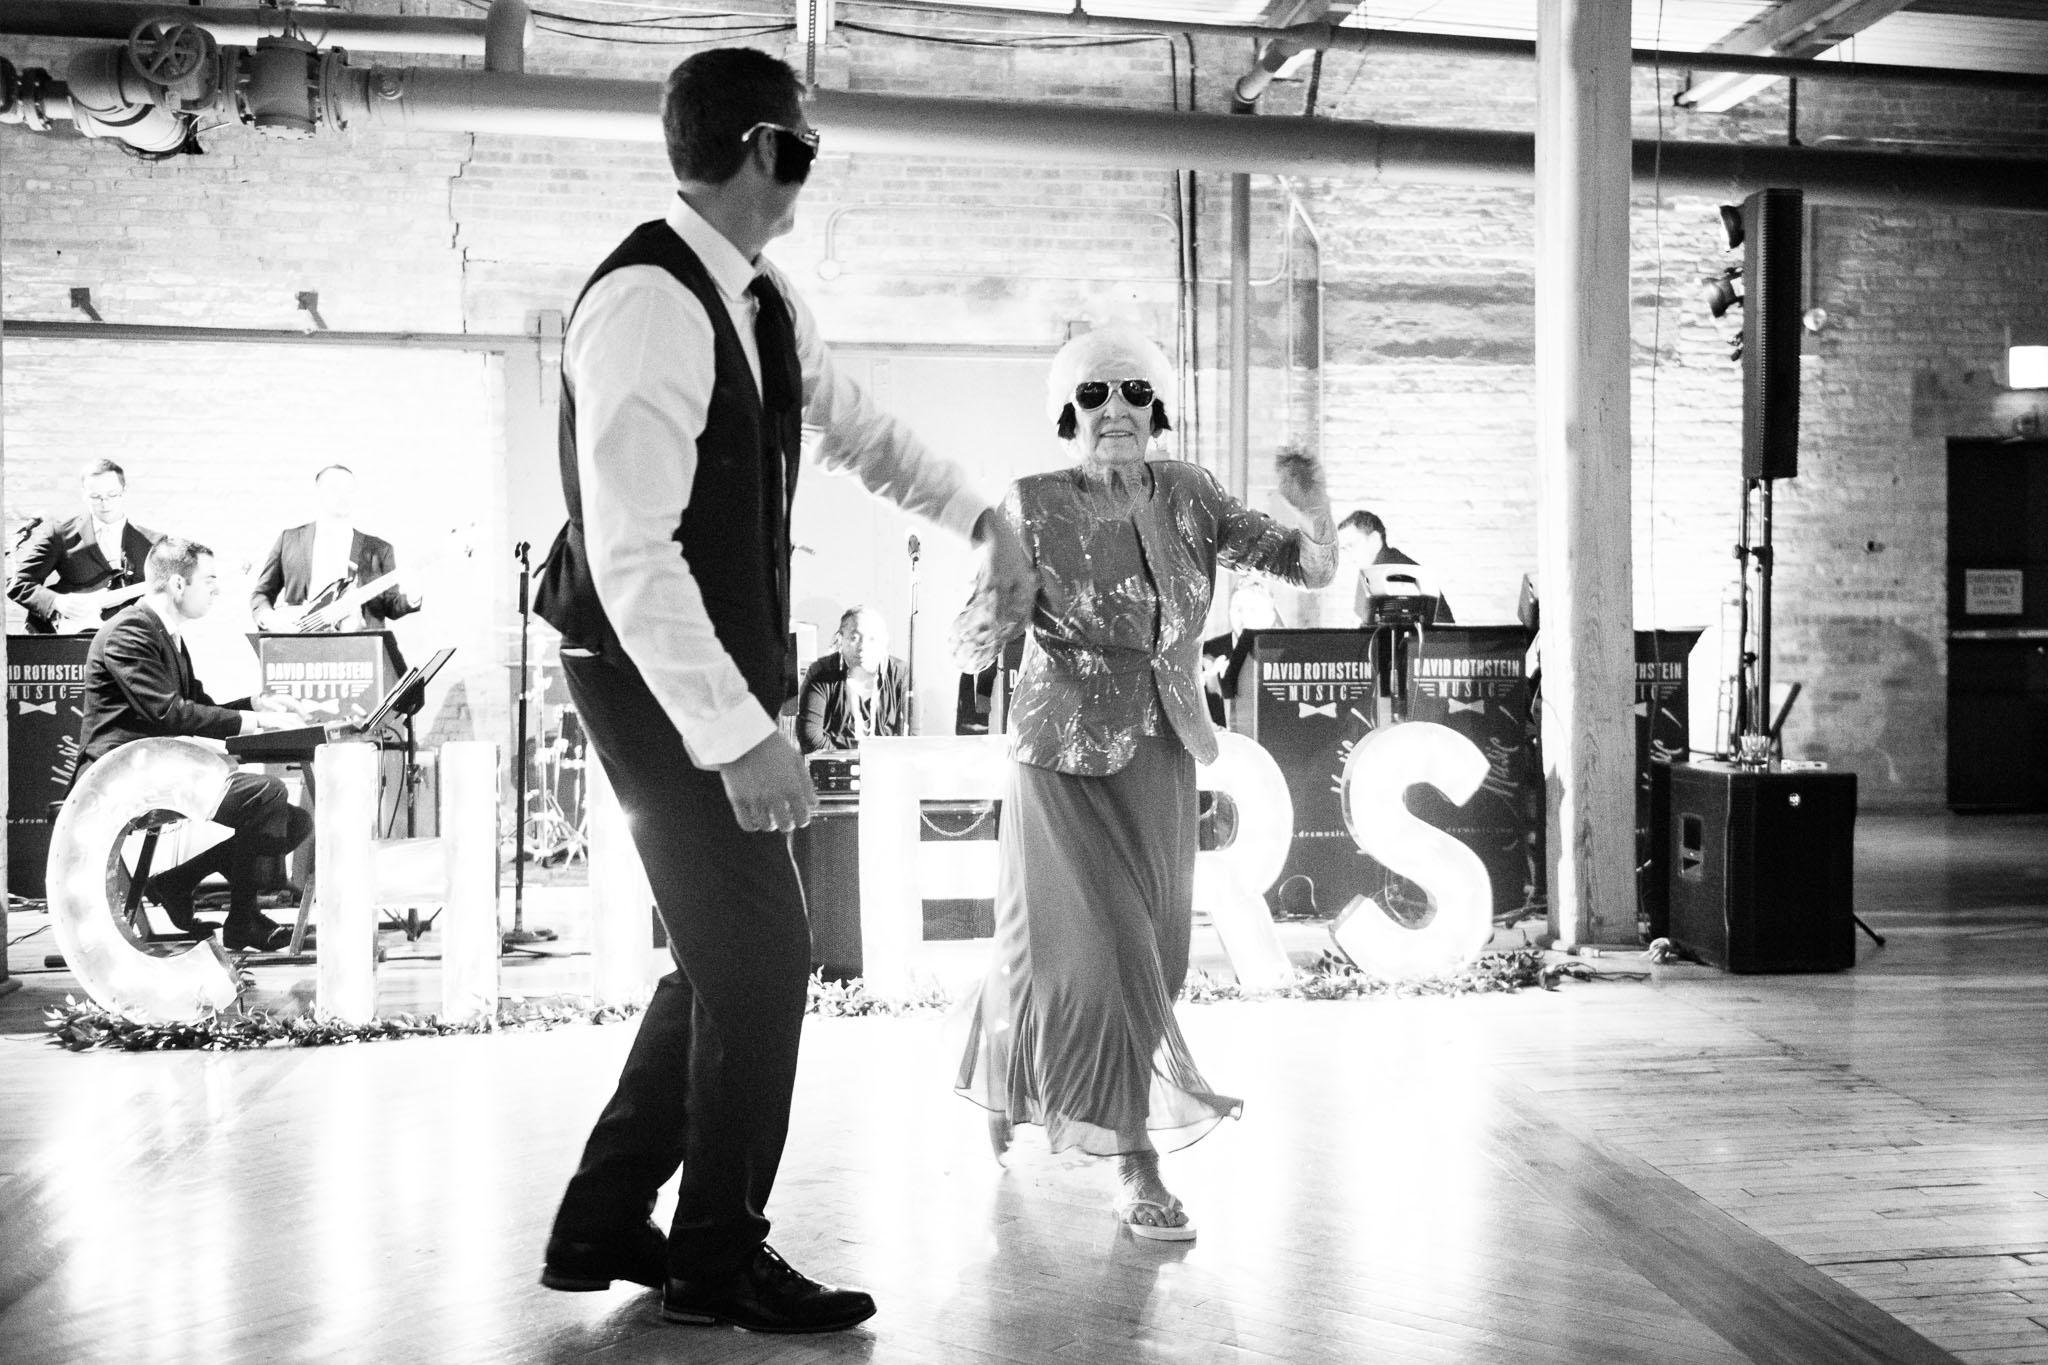 bridgeport-art-center-wedding-photos-43.jpg